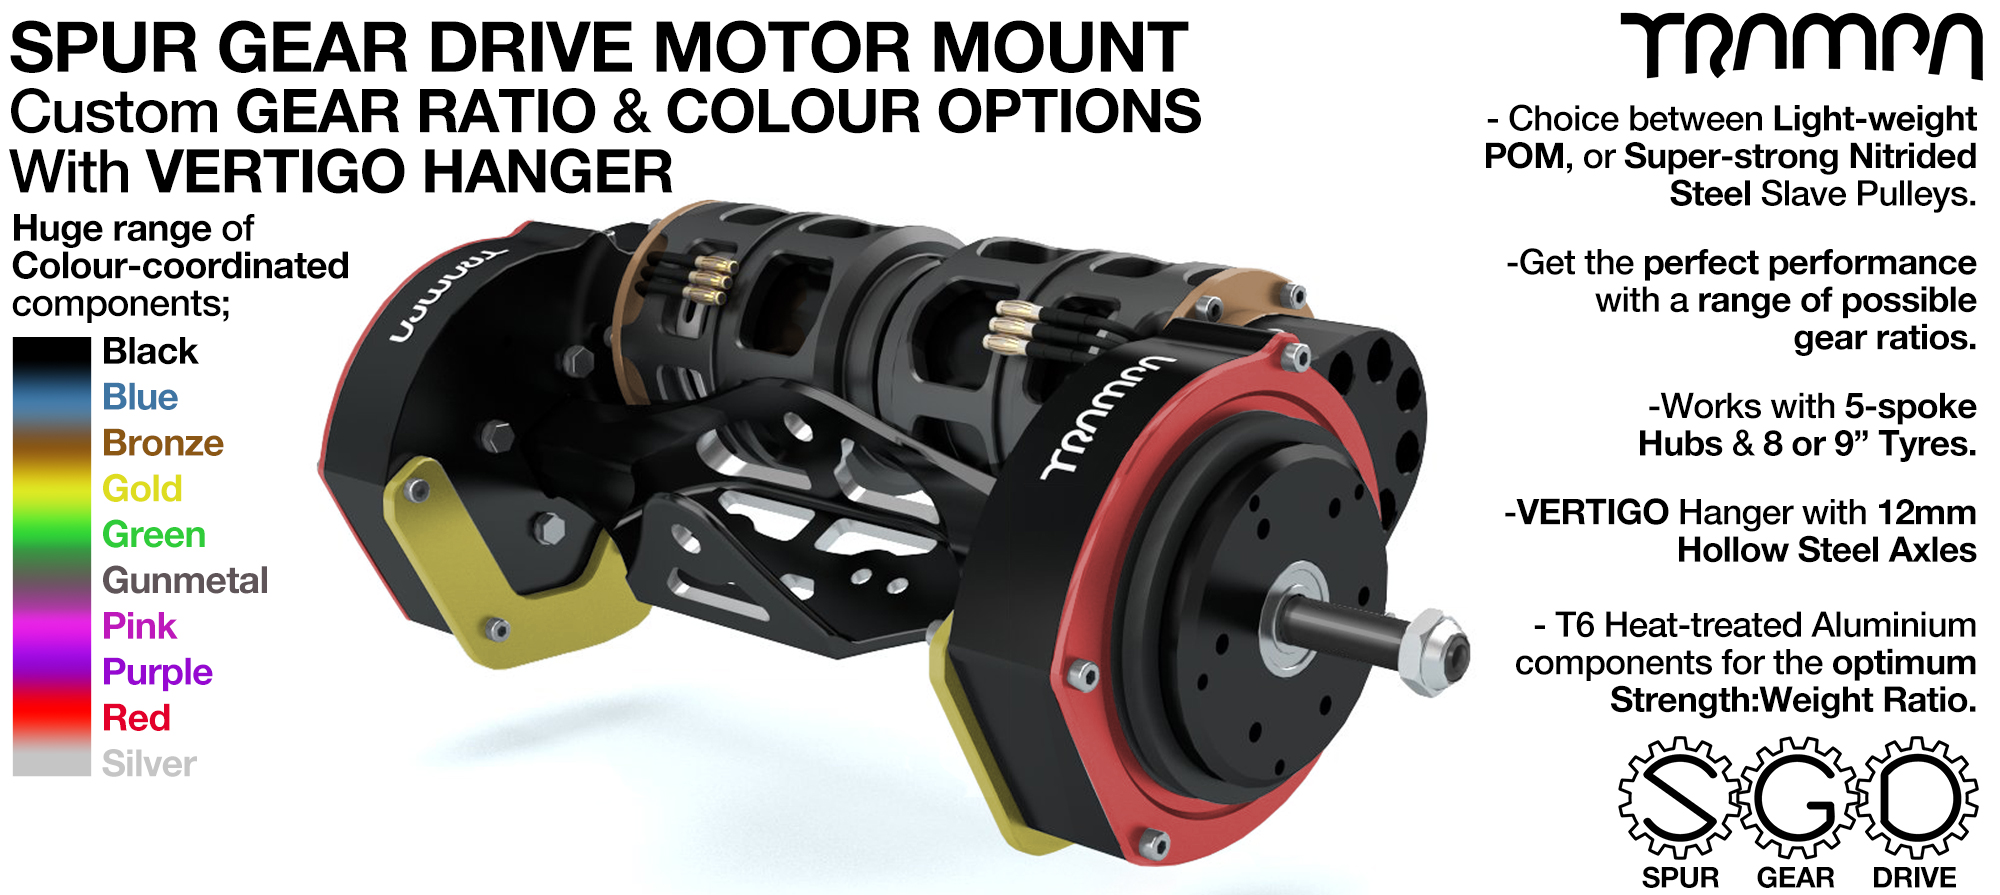 Mountainboard Spur Gear Drive TWIN Motor Mounts with Motors & VERTIGO Hanger